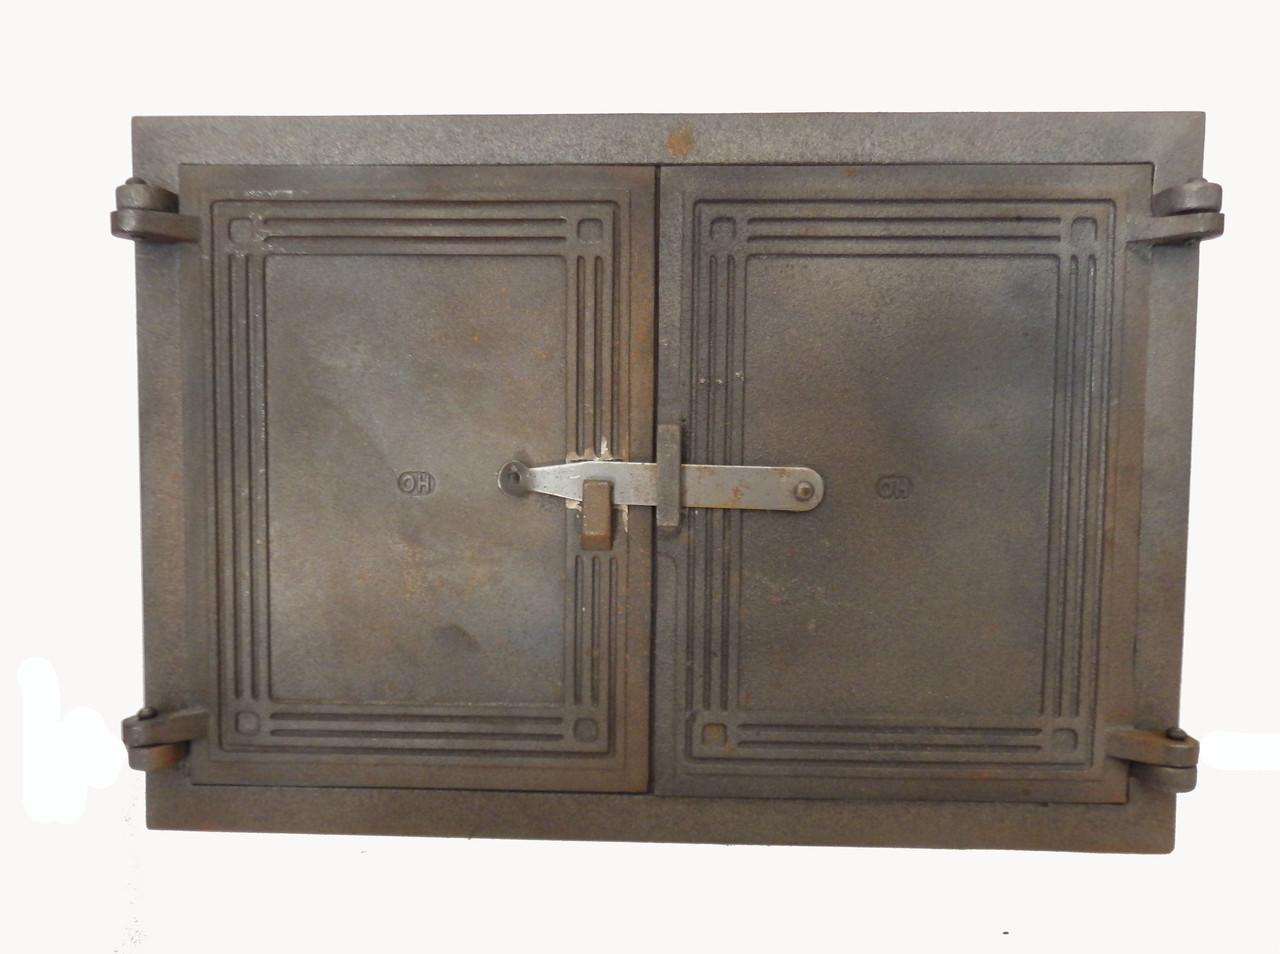 Чугунная дверца без стекла на две створки для печи - Dunántúl 46.5х34см-45х30см